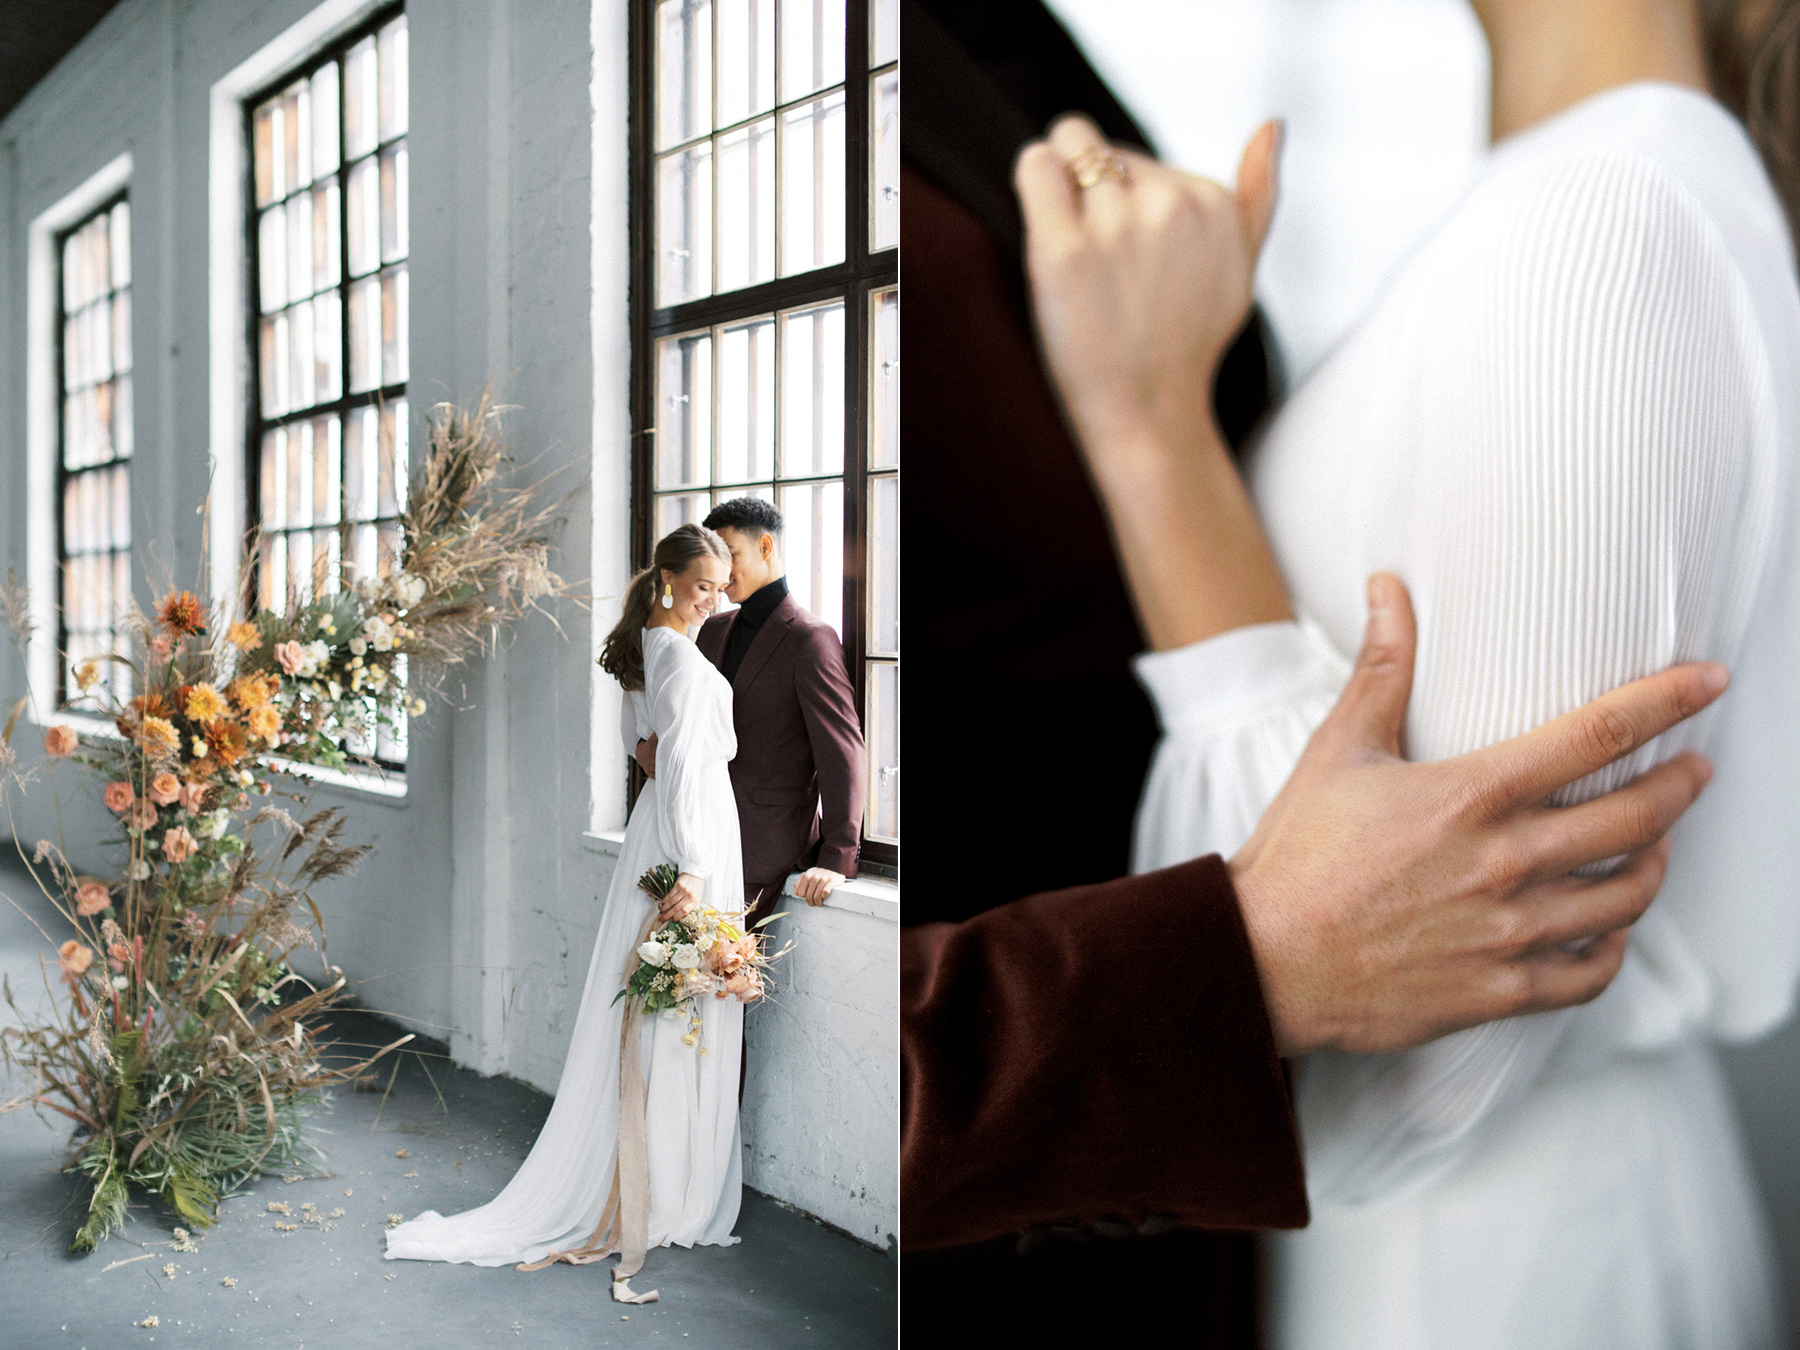 Hääkuvaus Fiskars, Nord & Mae, Susanna Nordvall, Destination Wedding Photographer, Hääkimppu, Hääkuvaaja, Wedding Bouquet, Wedding Arch 2.jpg